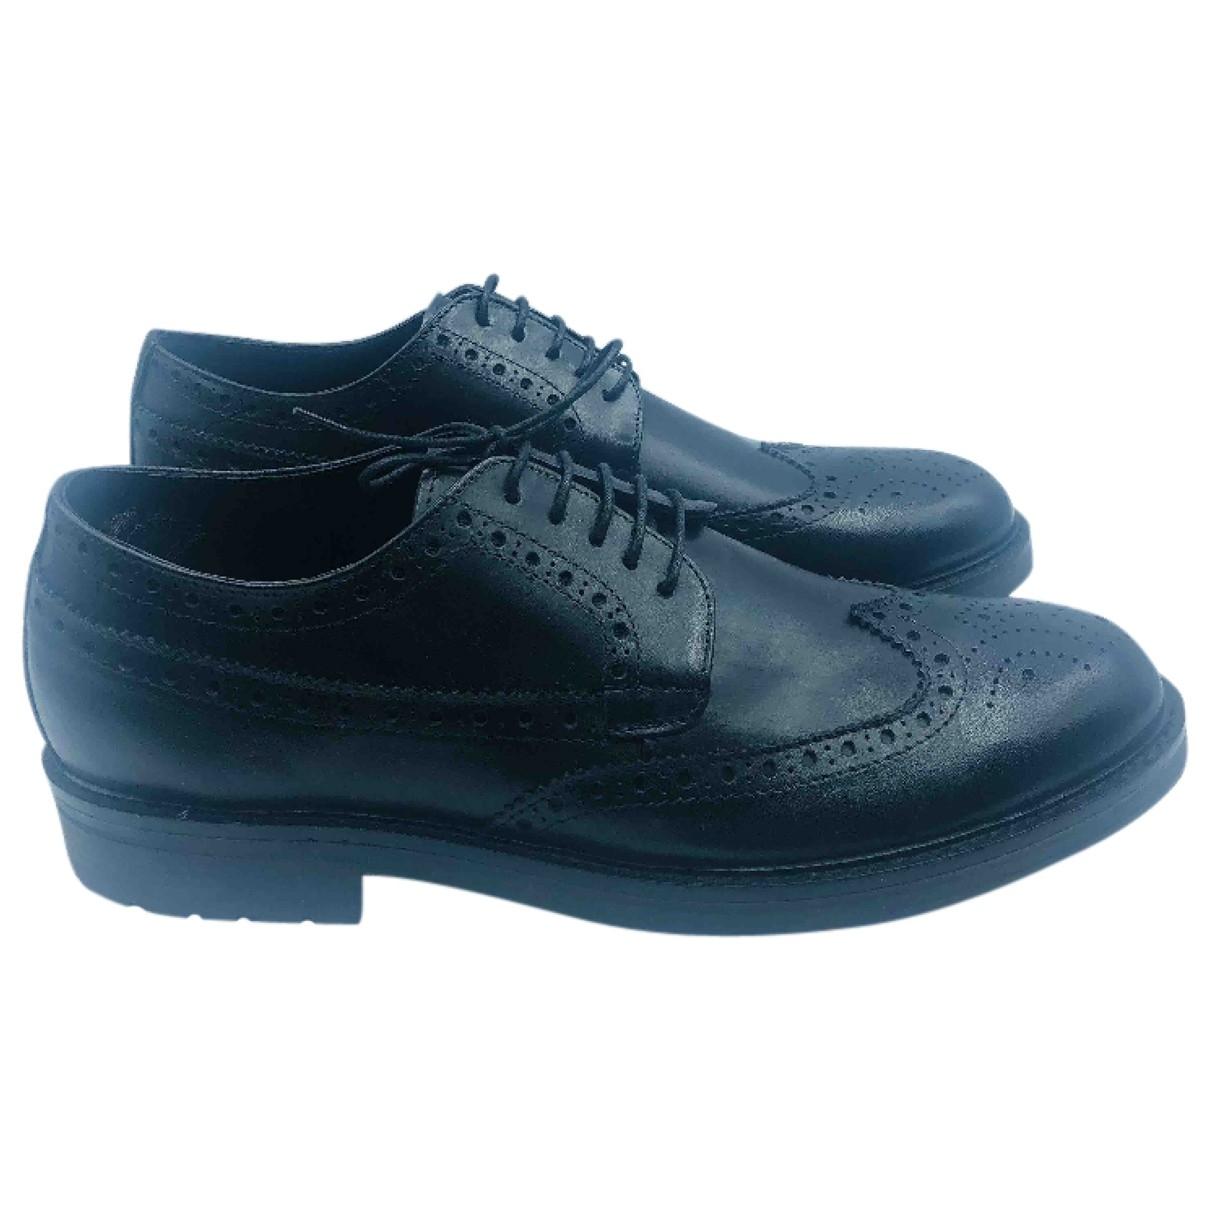 Trussardi \N Black Leather Flats for Men 46 EU